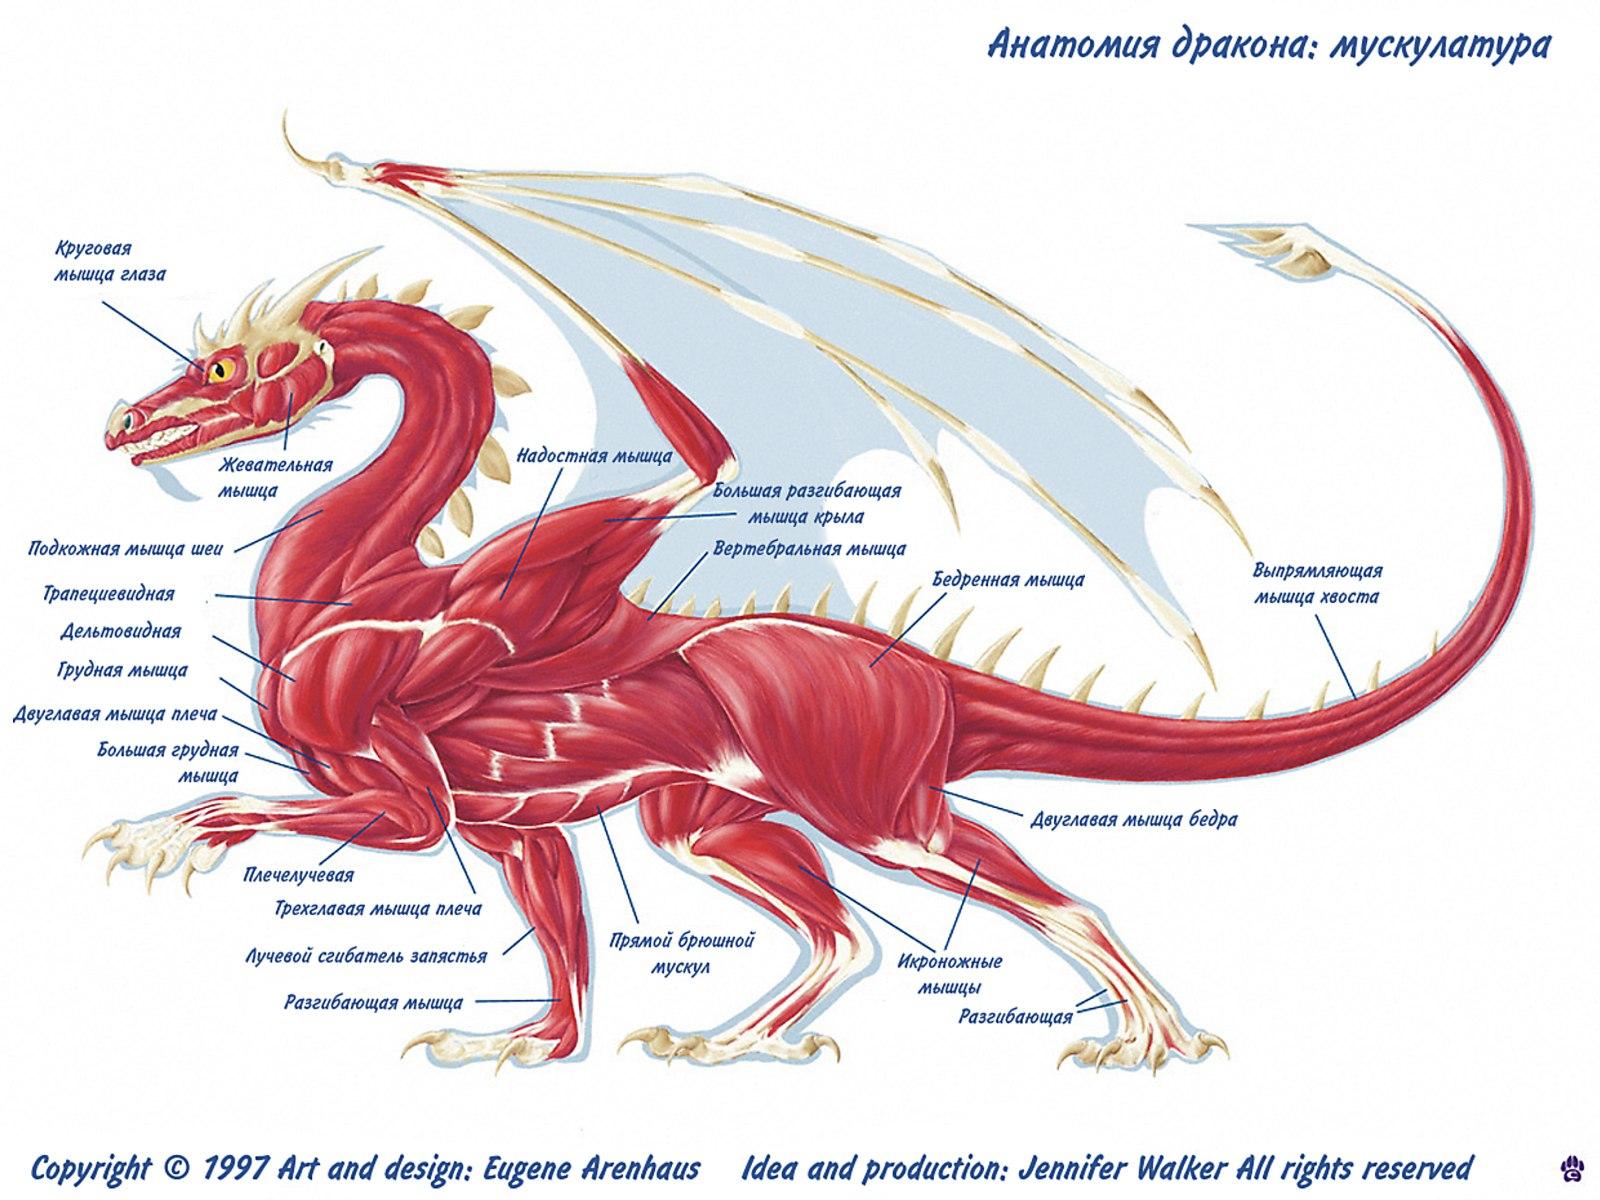 http://dragons-nest.ru/dragons/rasa_drakonov/img/025.jpg